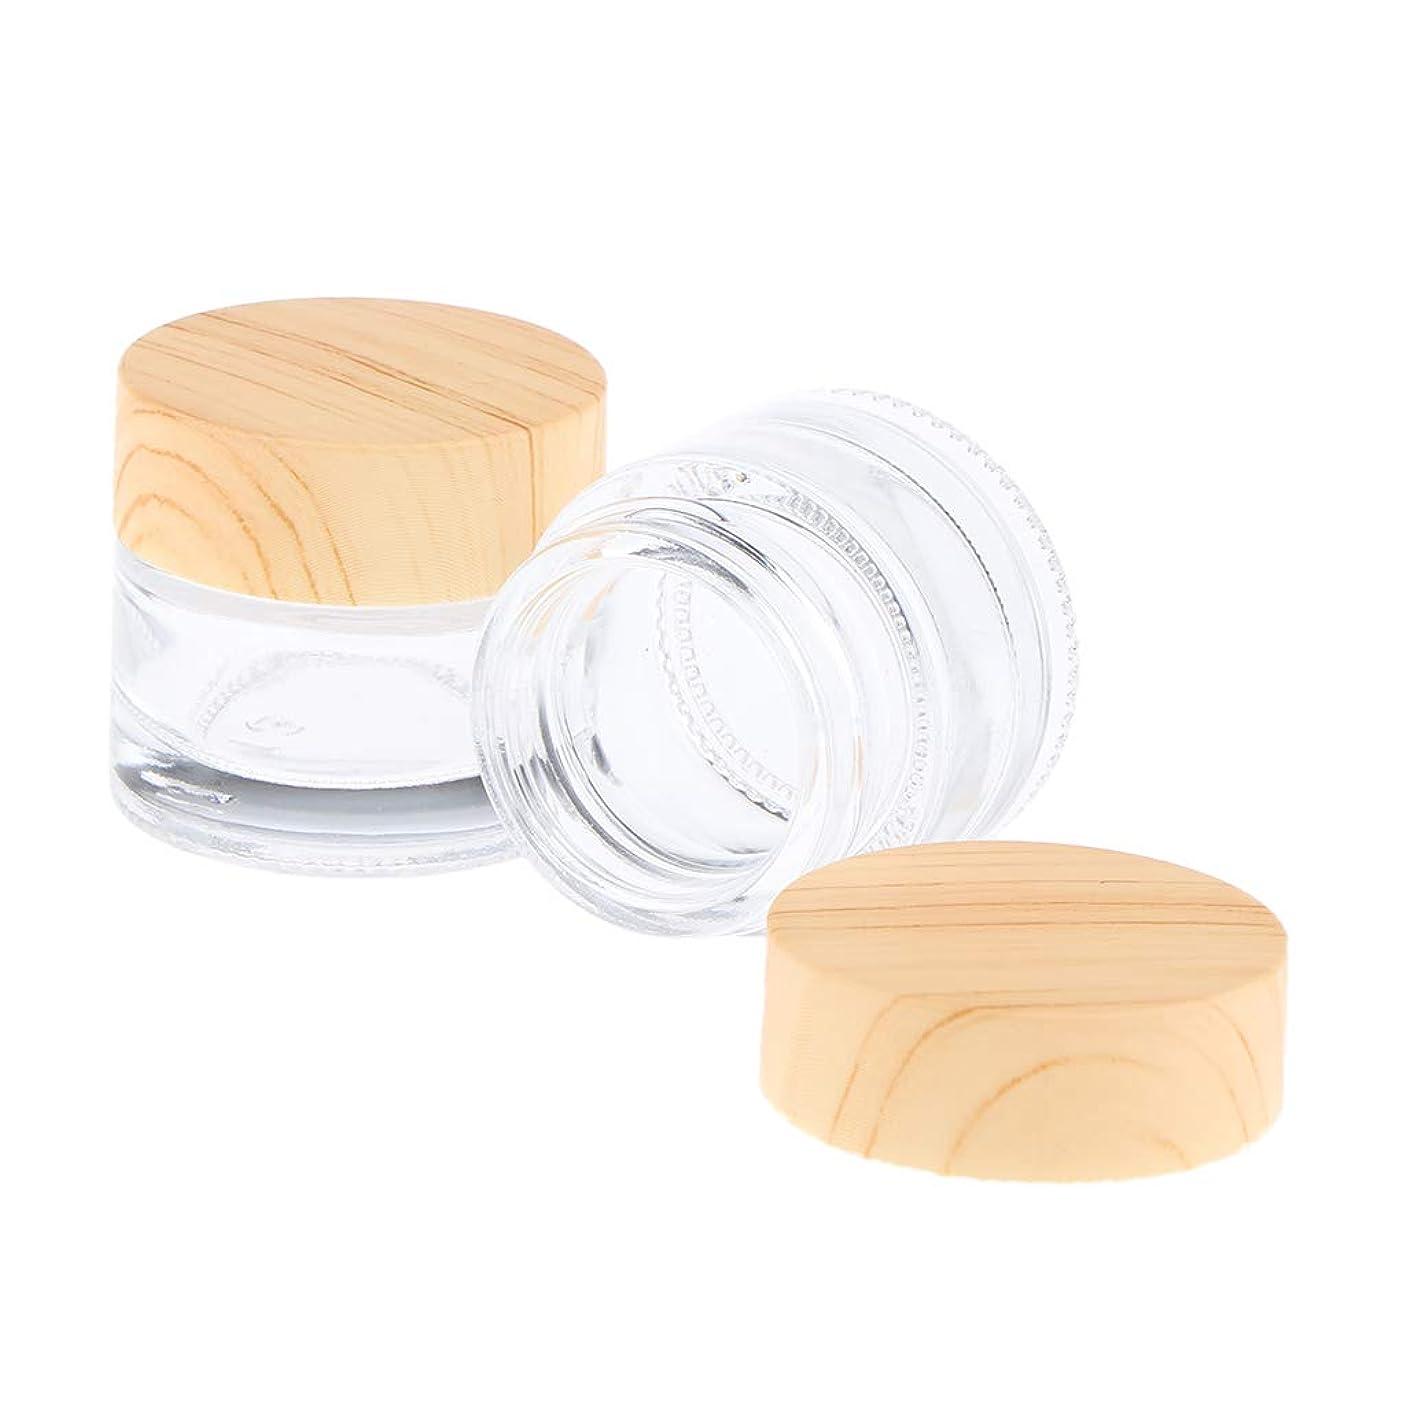 F Fityle 2個 空瓶 化粧品瓶 化粧ポット ローション クリーム ジェル 容器 クリア 5サイズ選べ - 10g